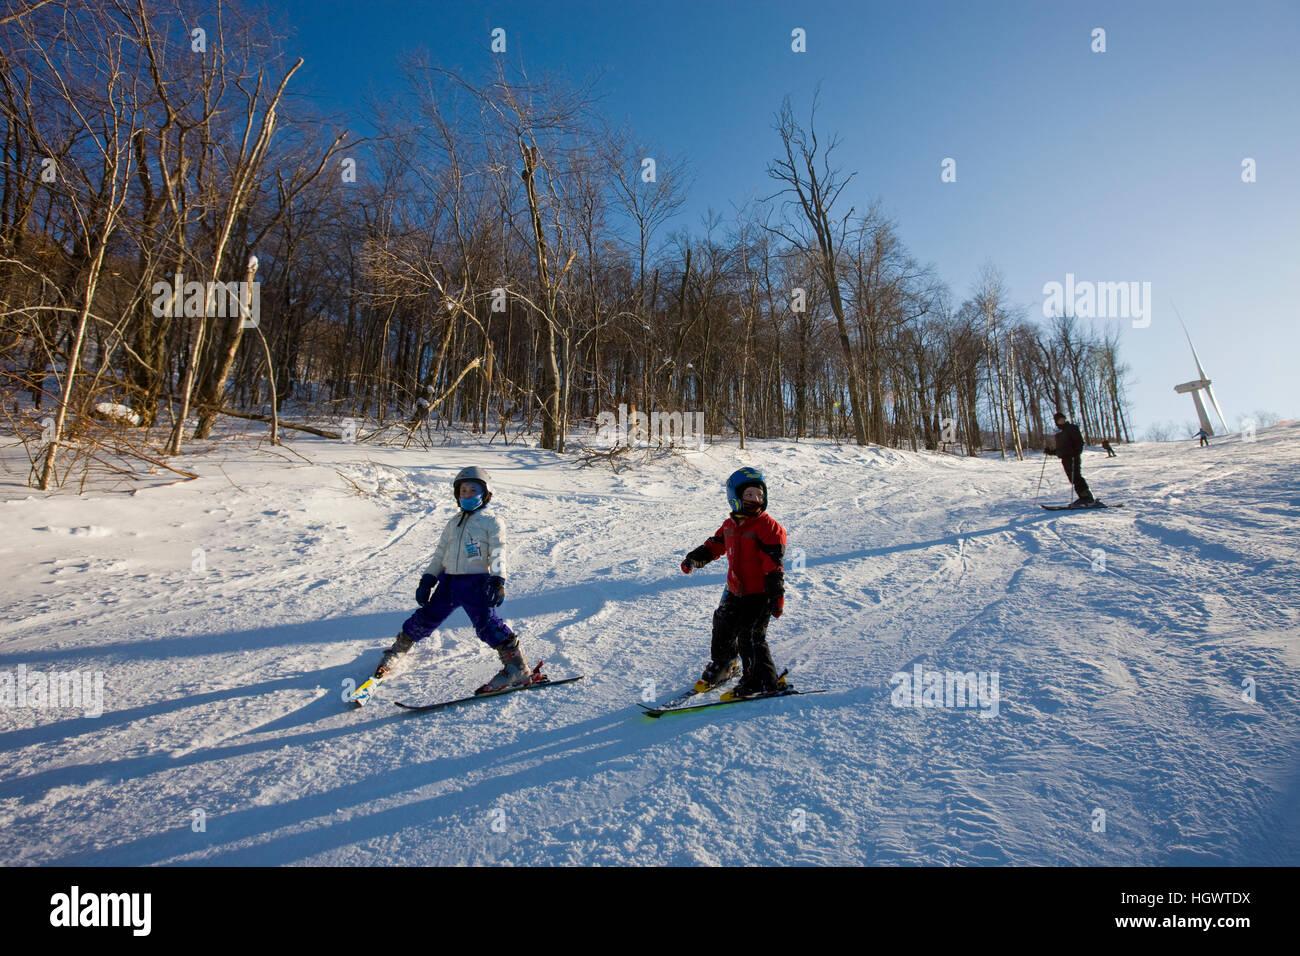 skiers at jiminy peak ski resort in the berkshire mountains in stock